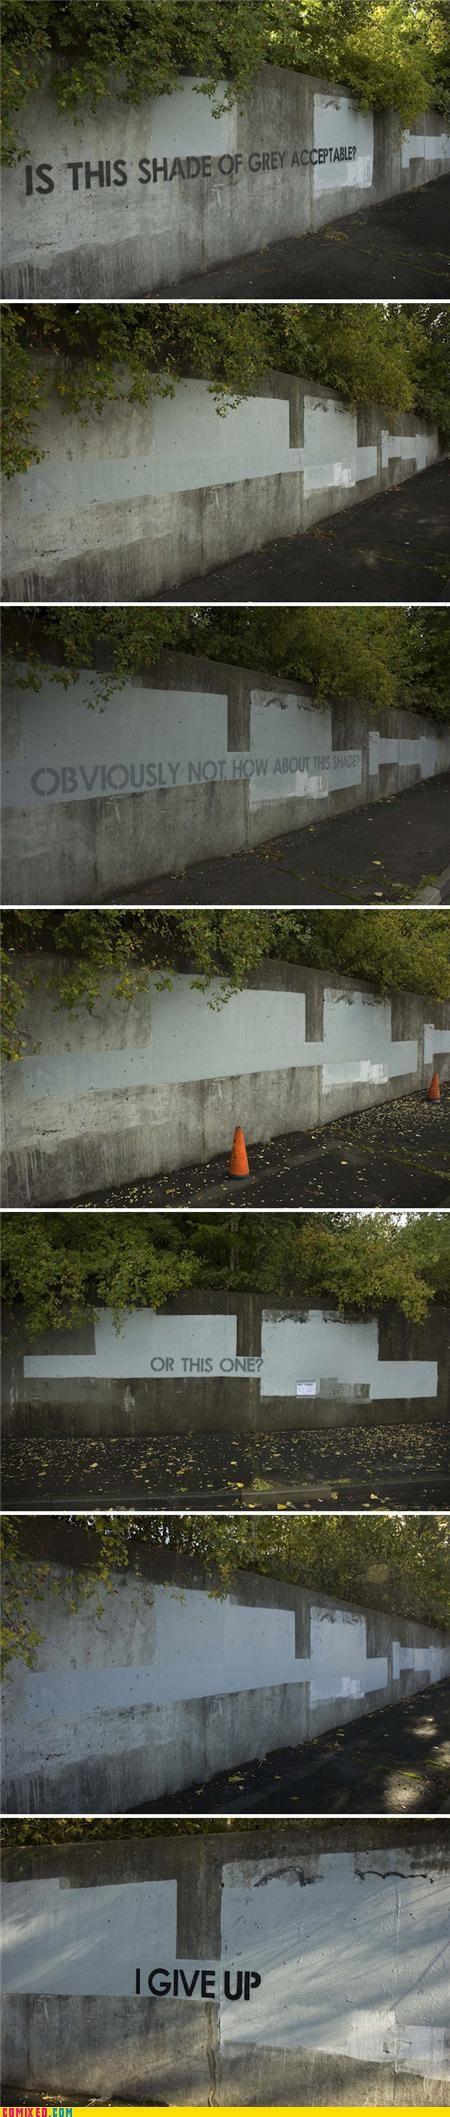 graffiti battle - LOL!!!